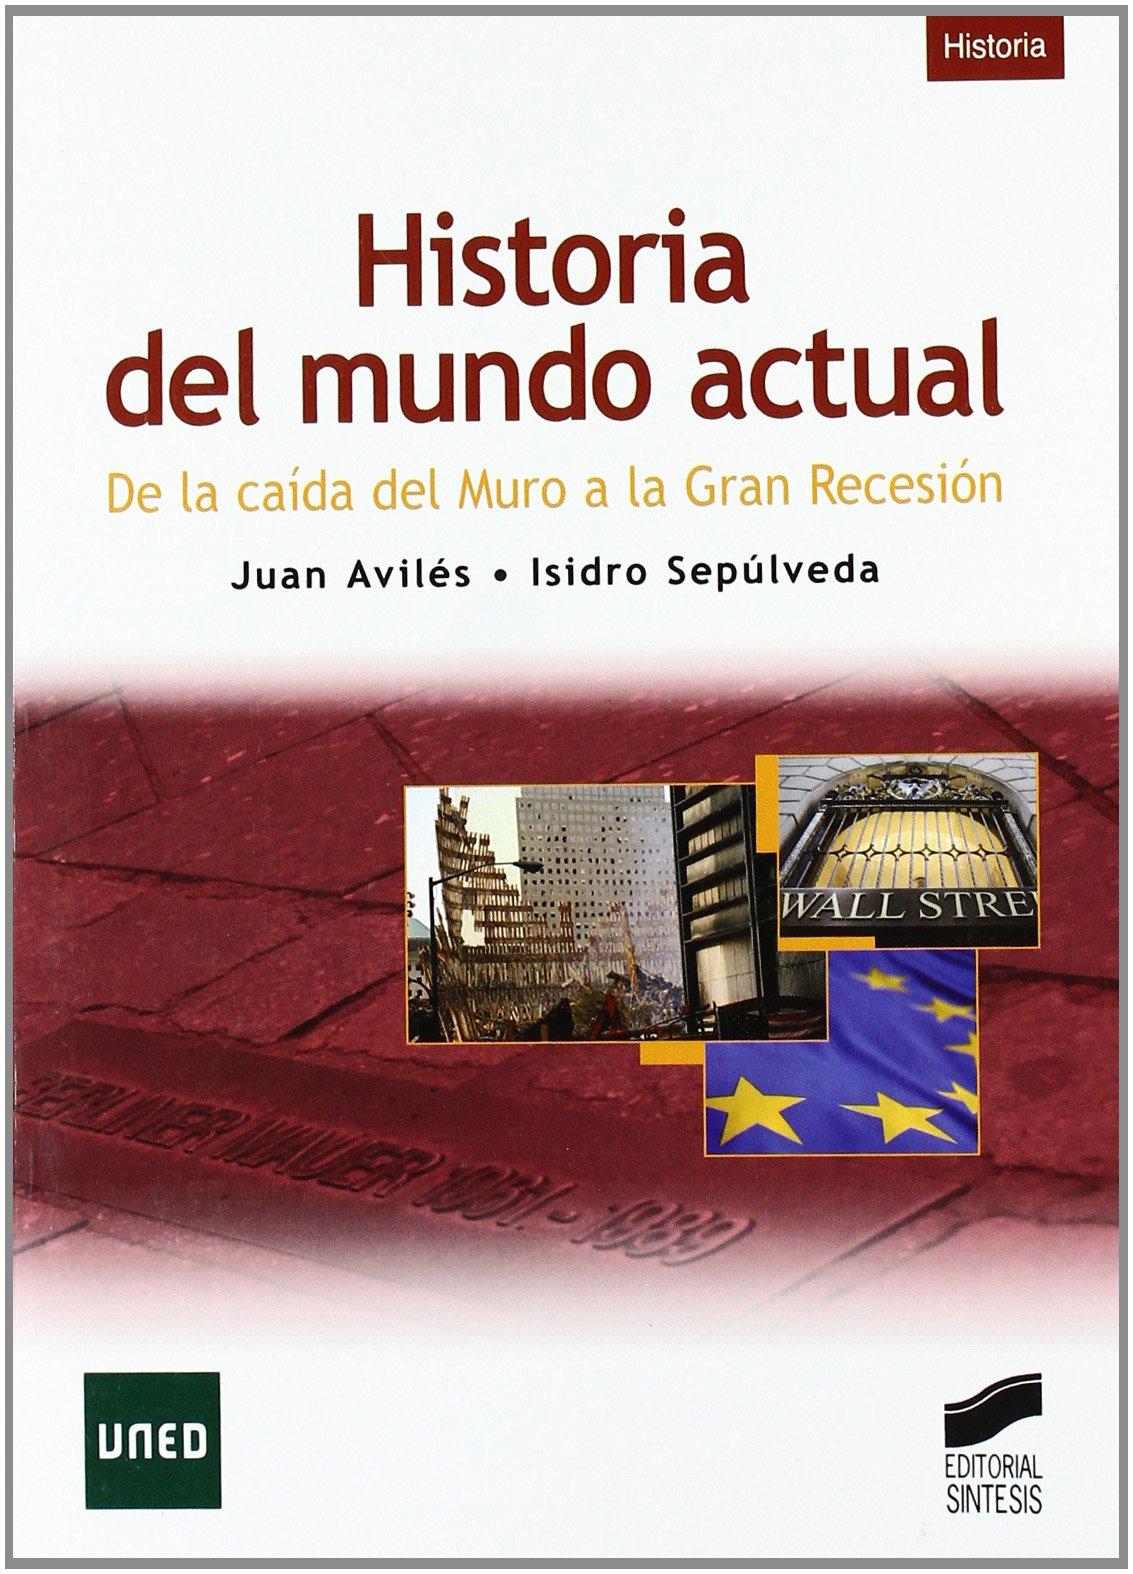 Historia del mundo actual: Amazon.es: Avilés Farré, Juan, Sepúlveda Muñoz, Isidro: Libros